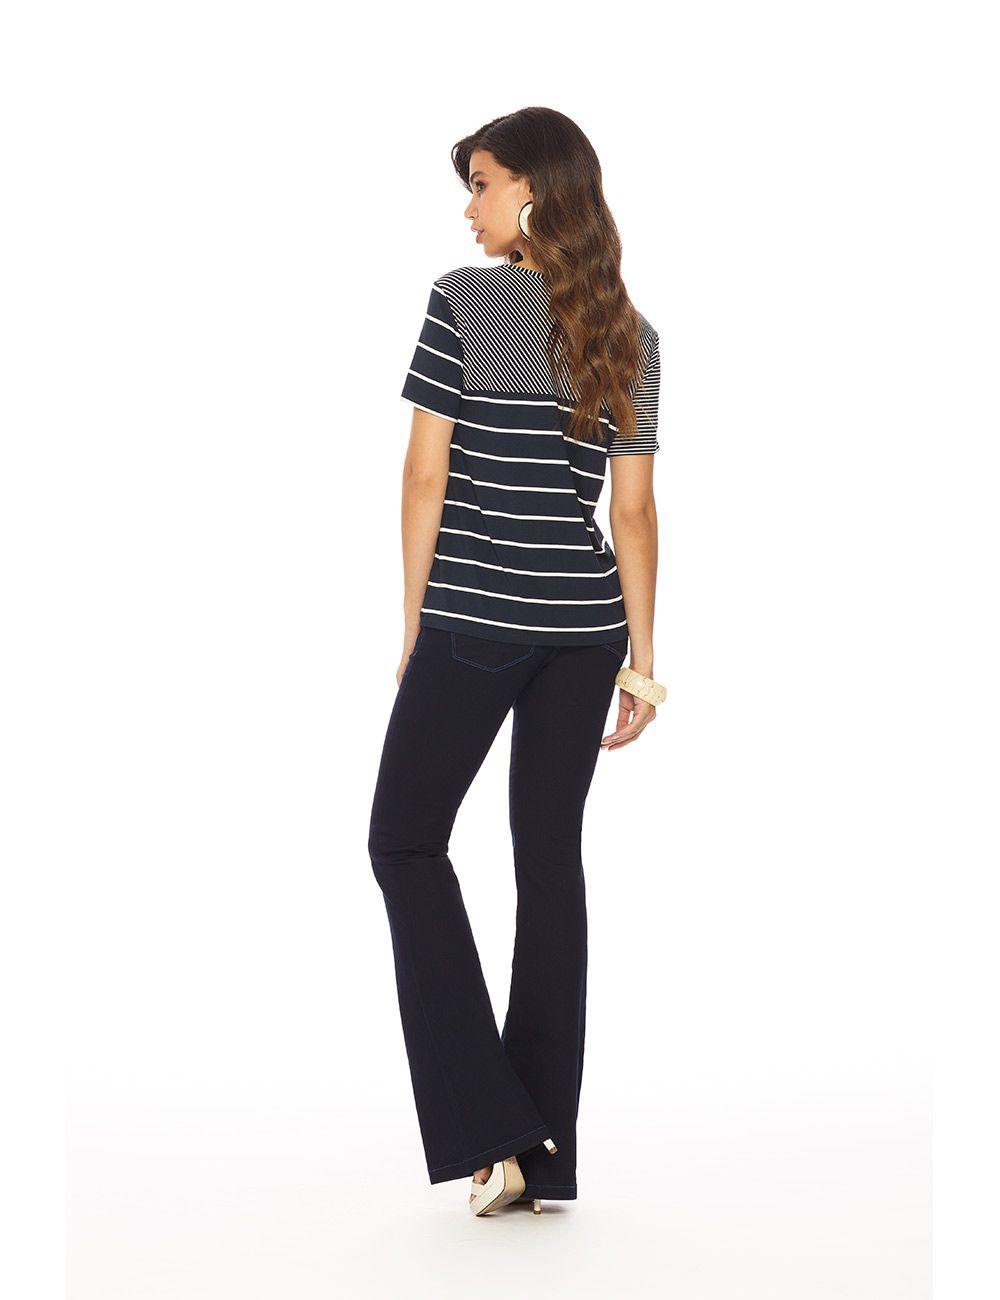 Calça jeans flare c/ elastano cós médio